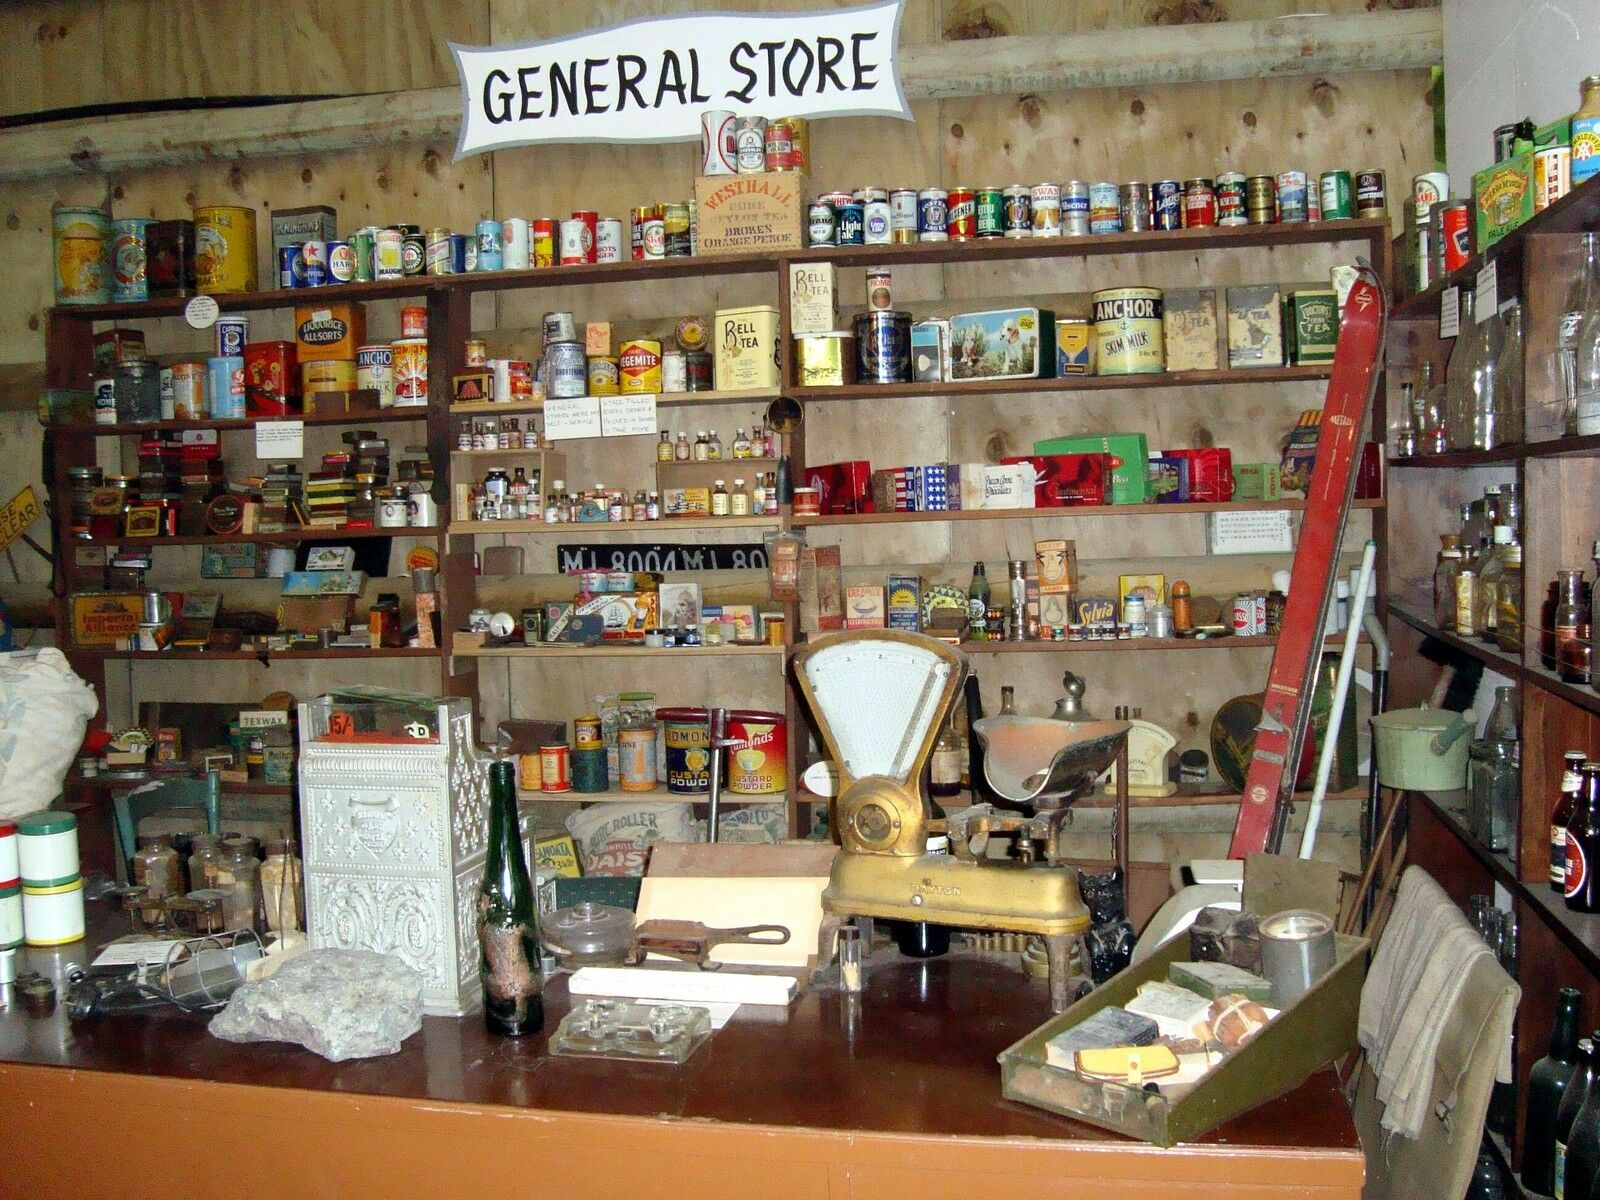 Wealot's General Store